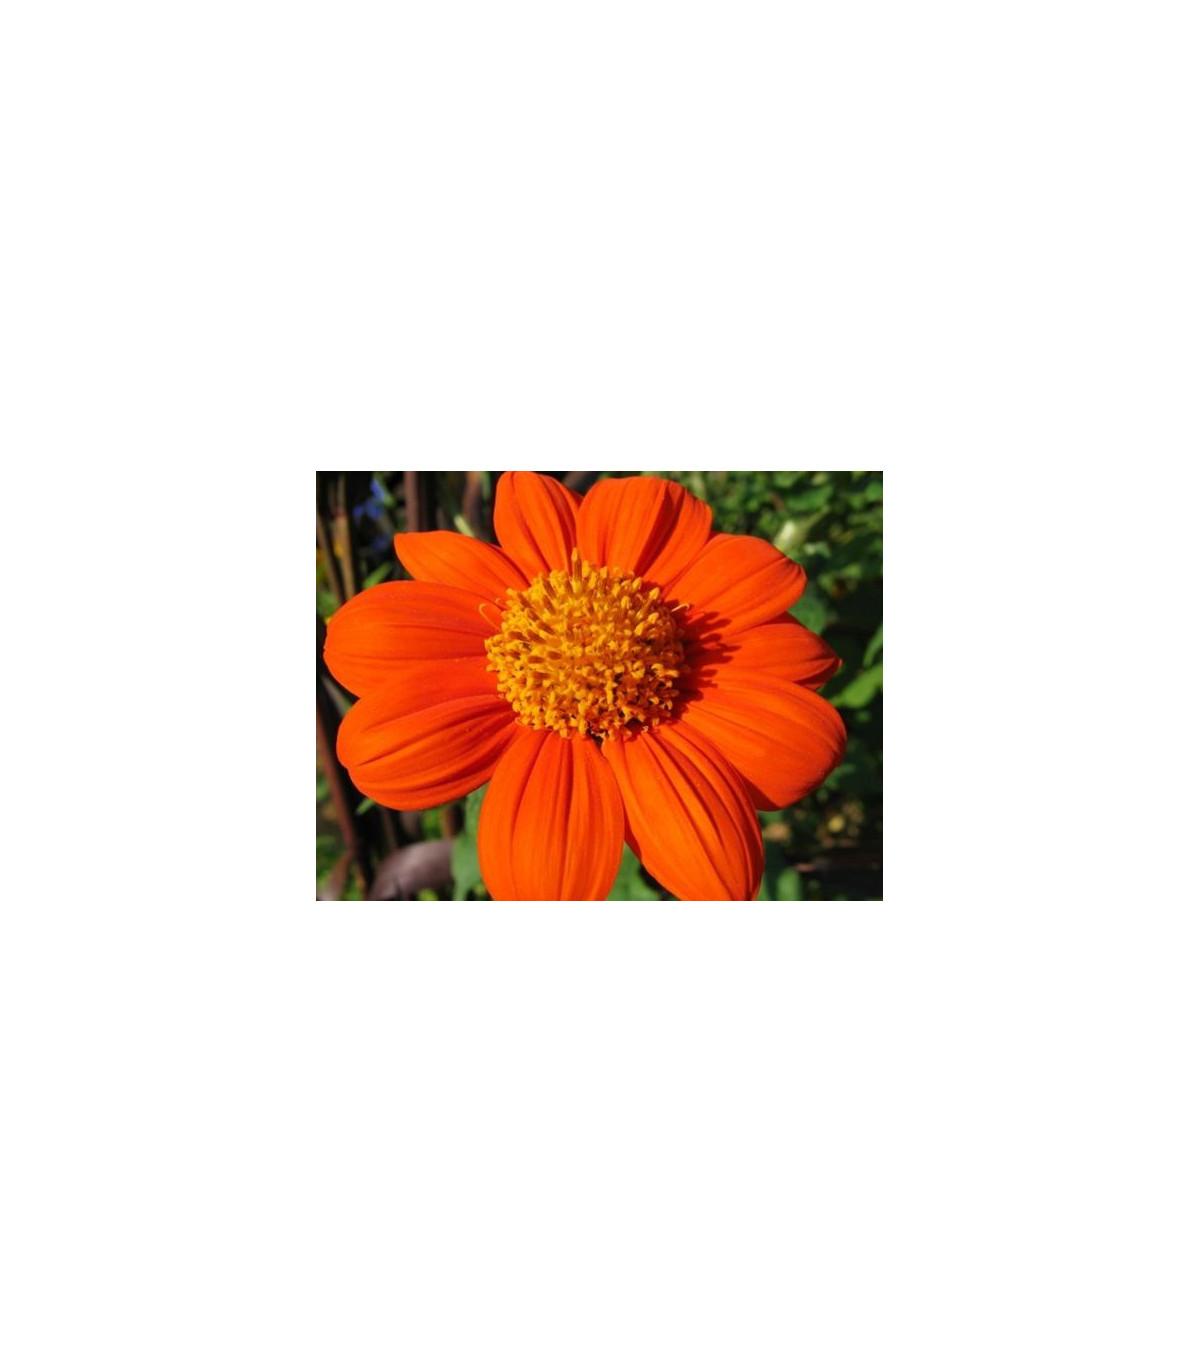 Titónie okrouhlolistá - Tithonia rotundifolia - semena titónie - 60 ks